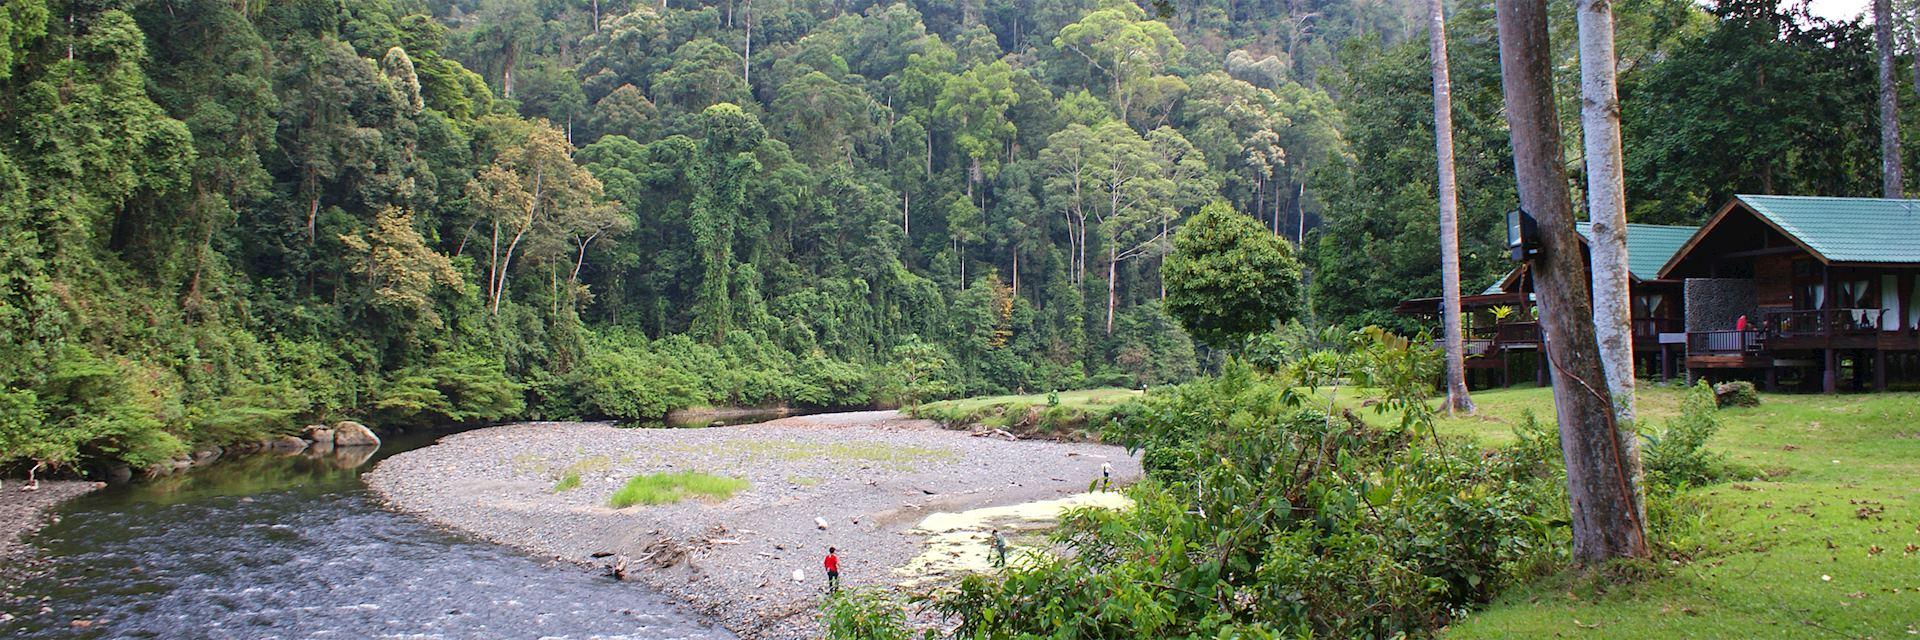 Borneo Rainforest Lodge in the Danum Valley